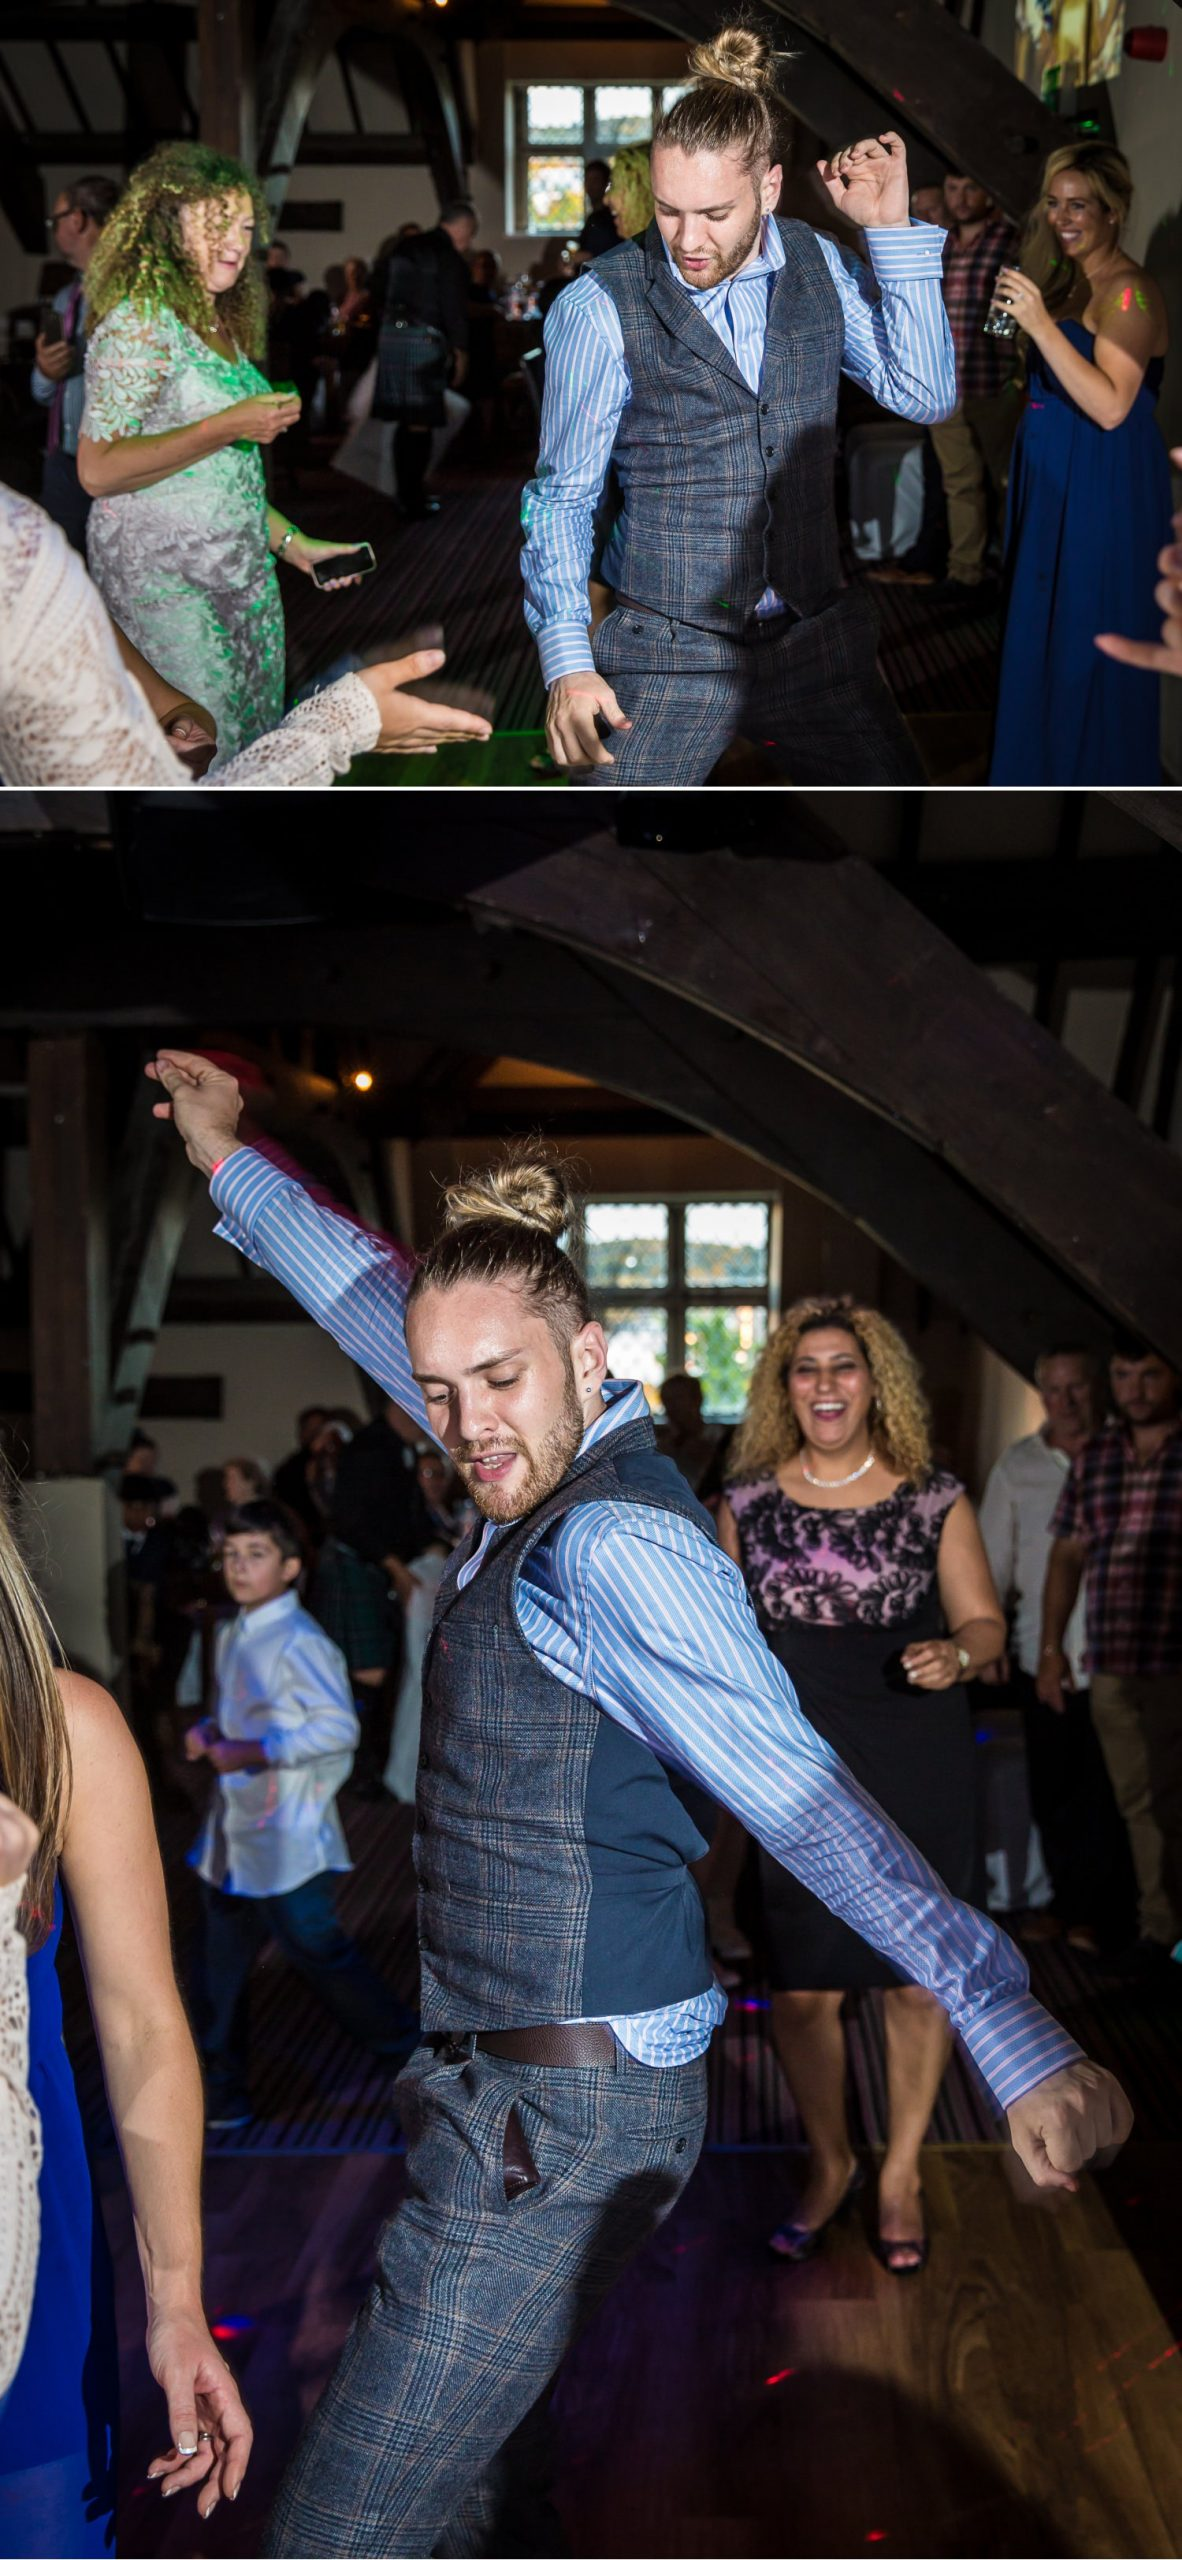 Guests dancing on Faenol Fawr photograph